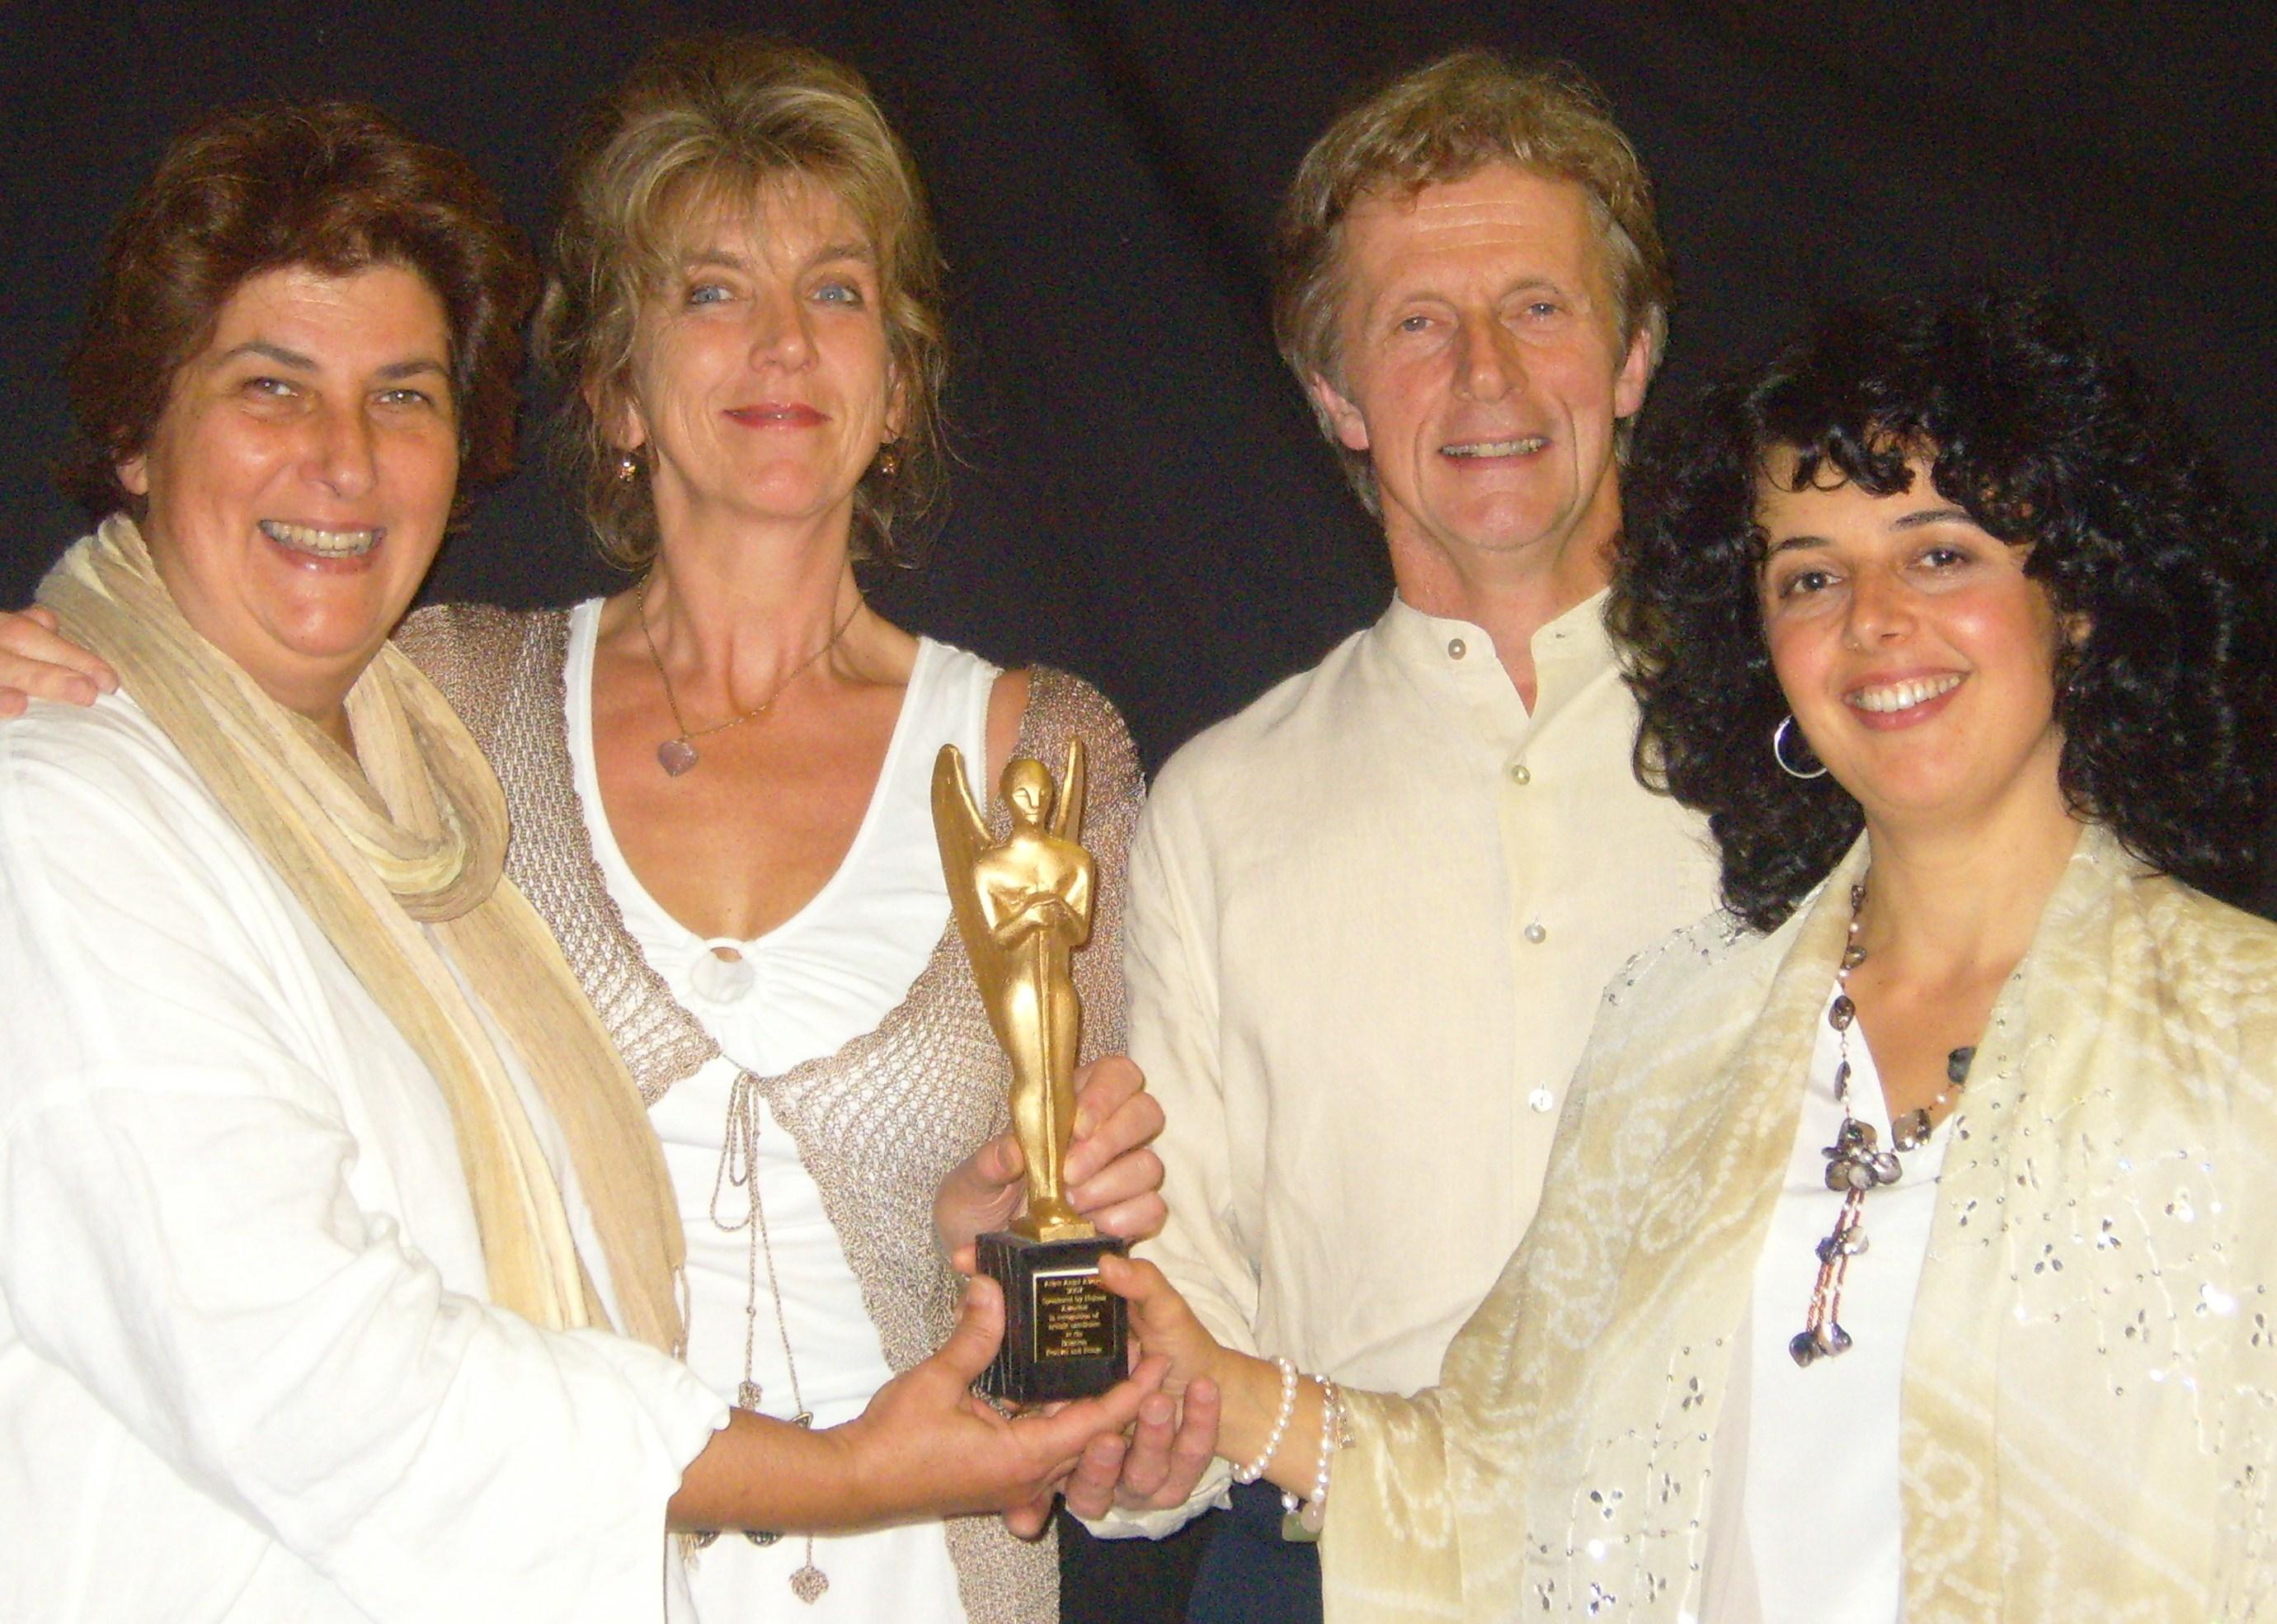 psyche-eros-award-2007.jpg